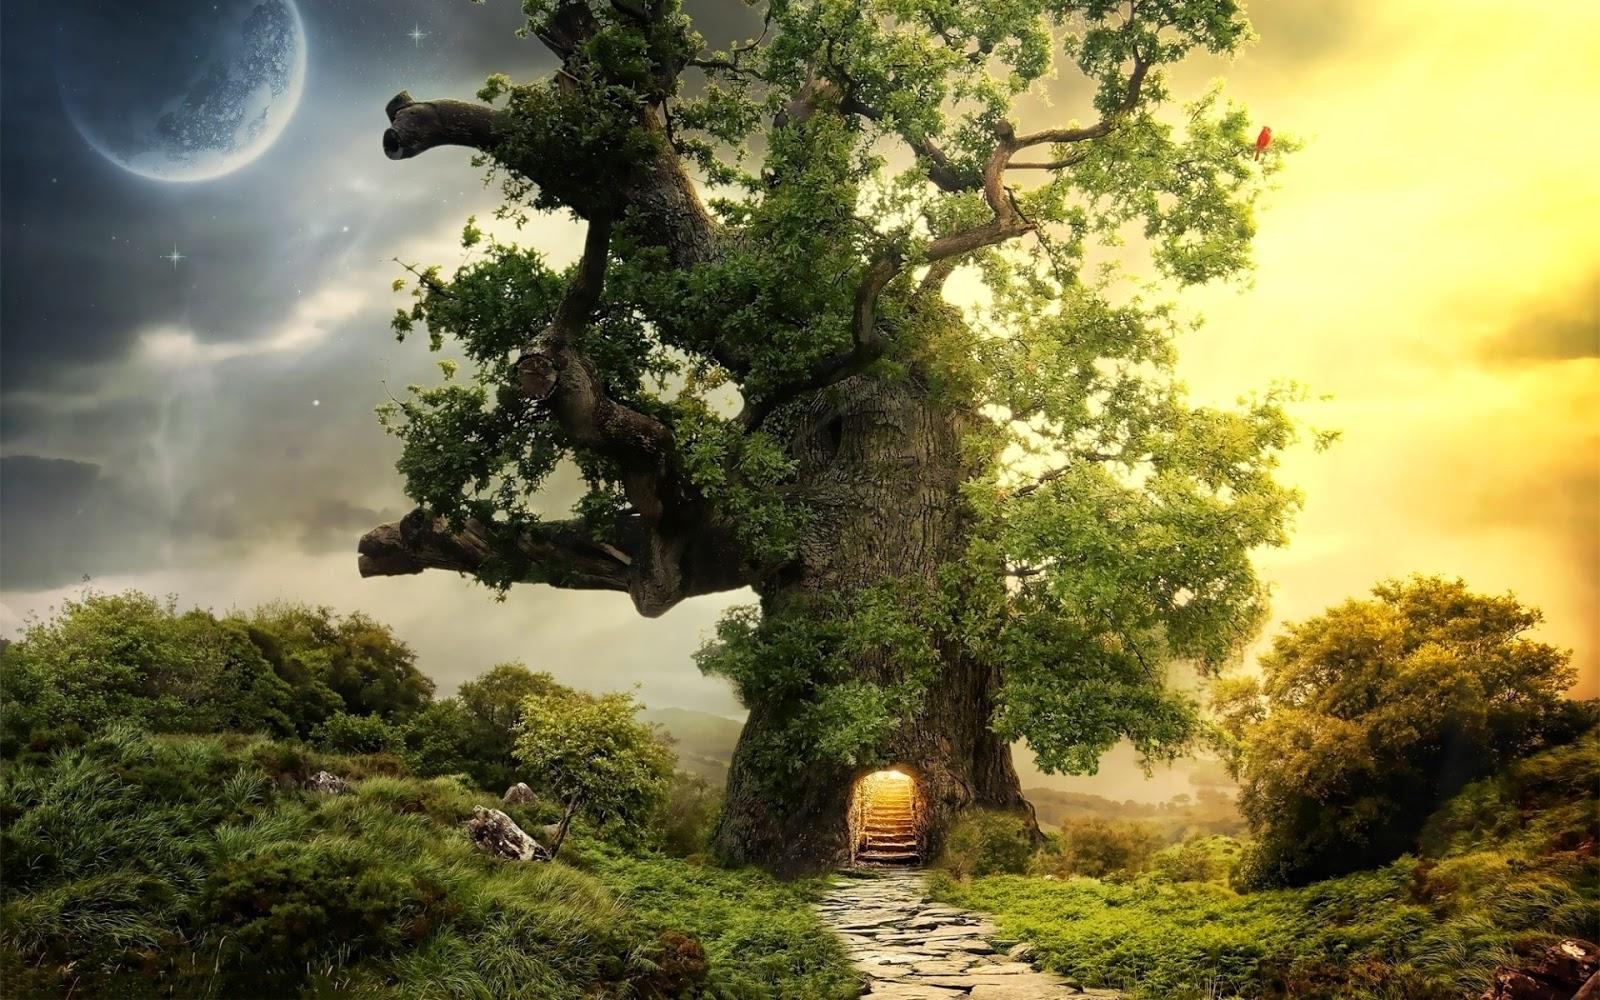 fantasy-house-tree-designs-real-world-1920x1200.jpg